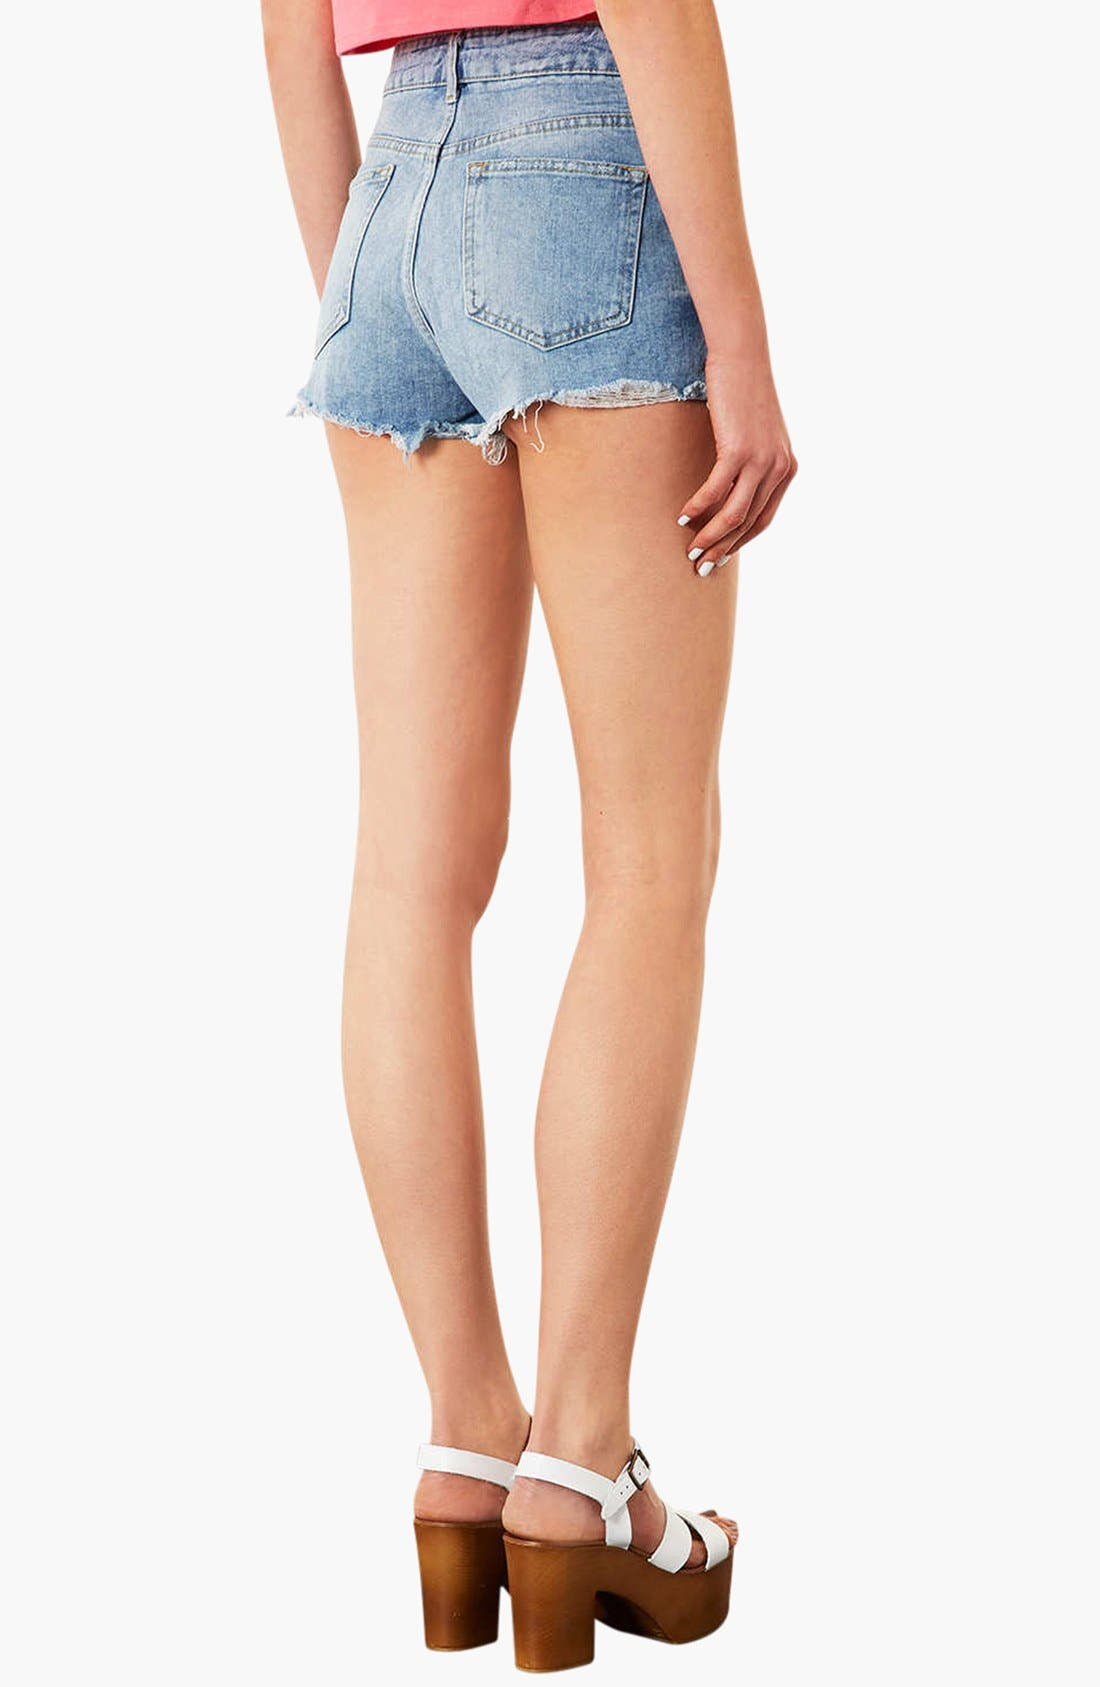 TOPSHOP,                             Moto 'Ruthie' Distressed Denim Shorts,                             Alternate thumbnail 2, color,                             420